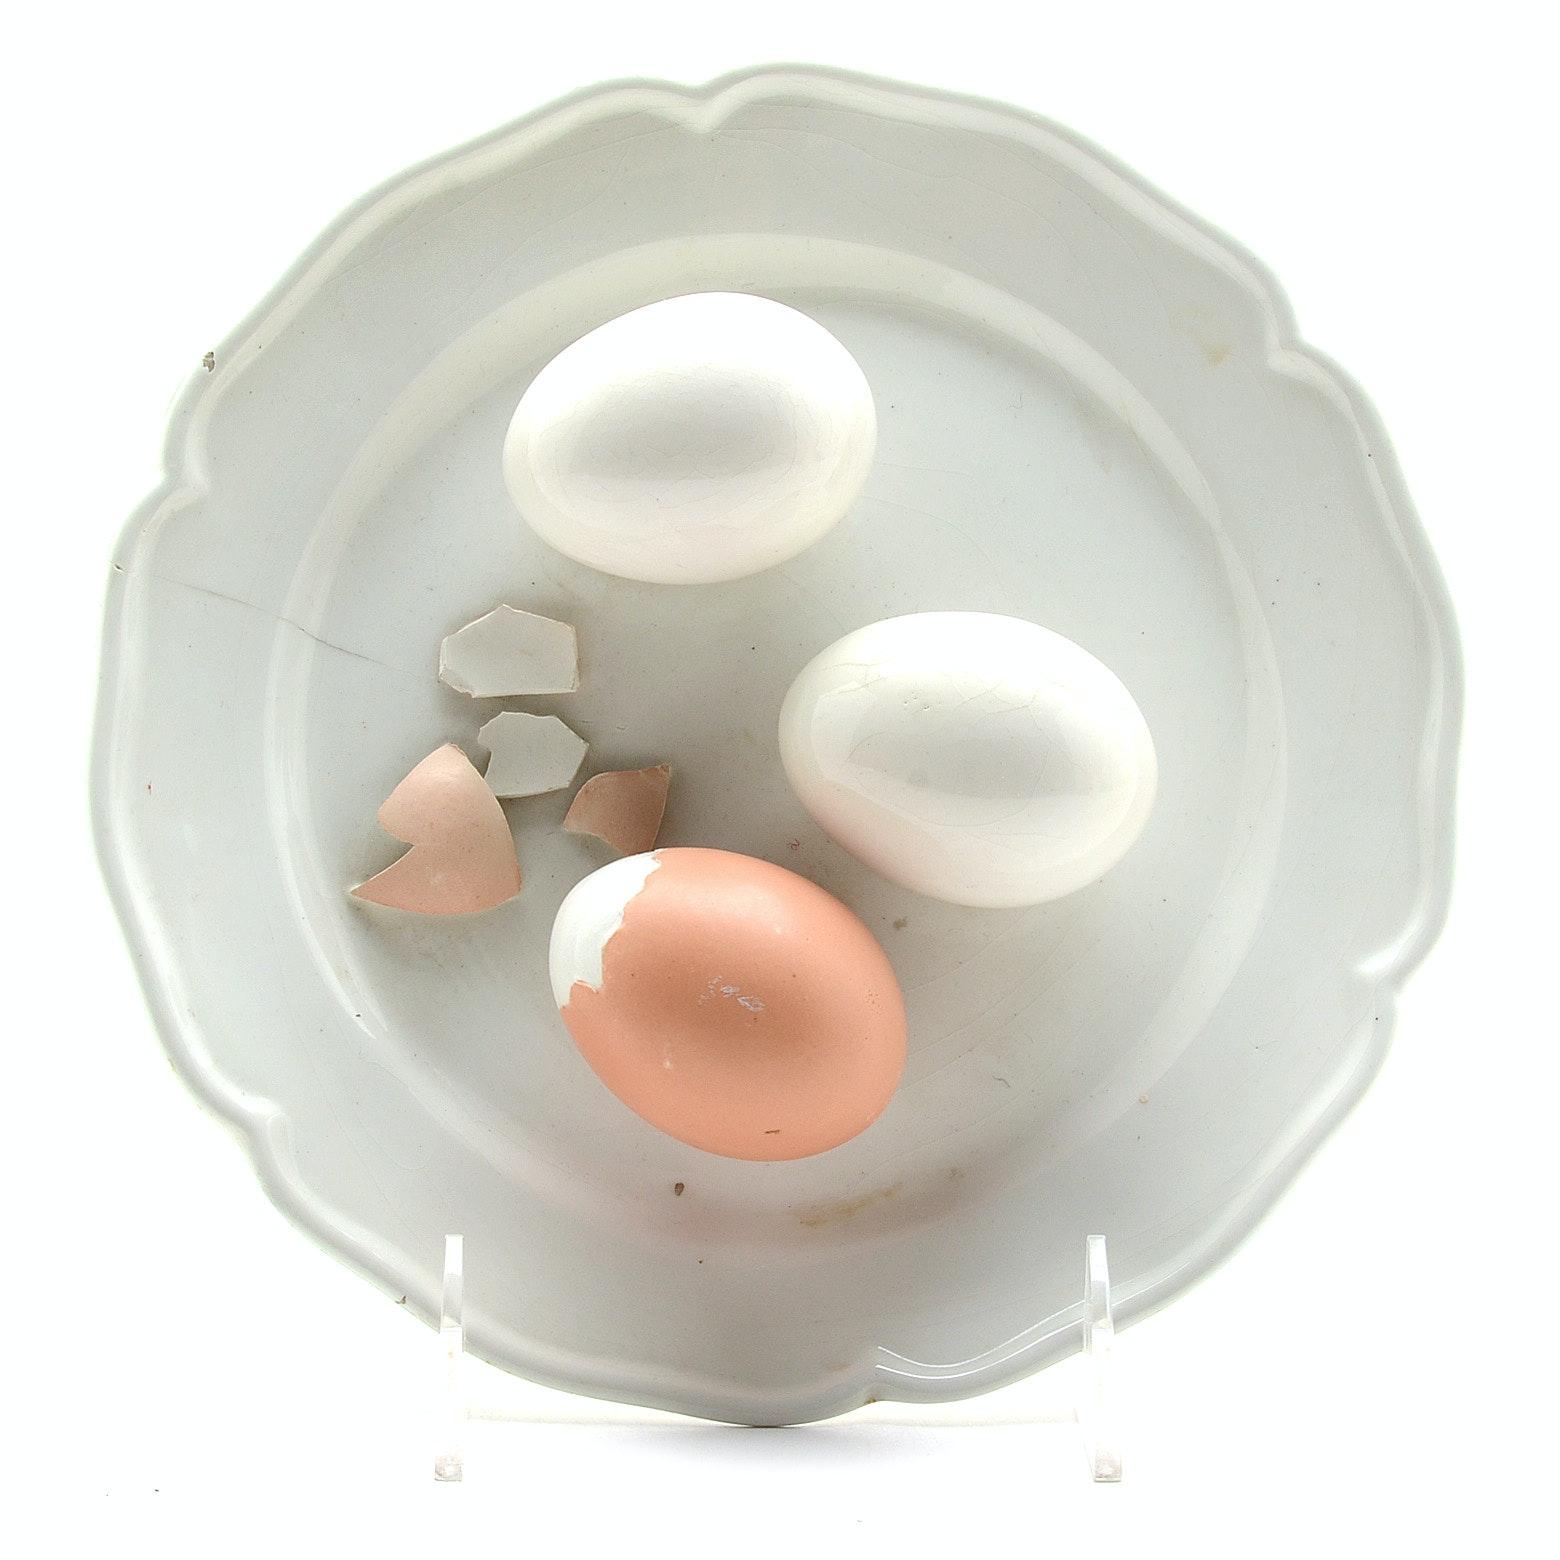 Este Ceramic Plate With Decorative Eggs